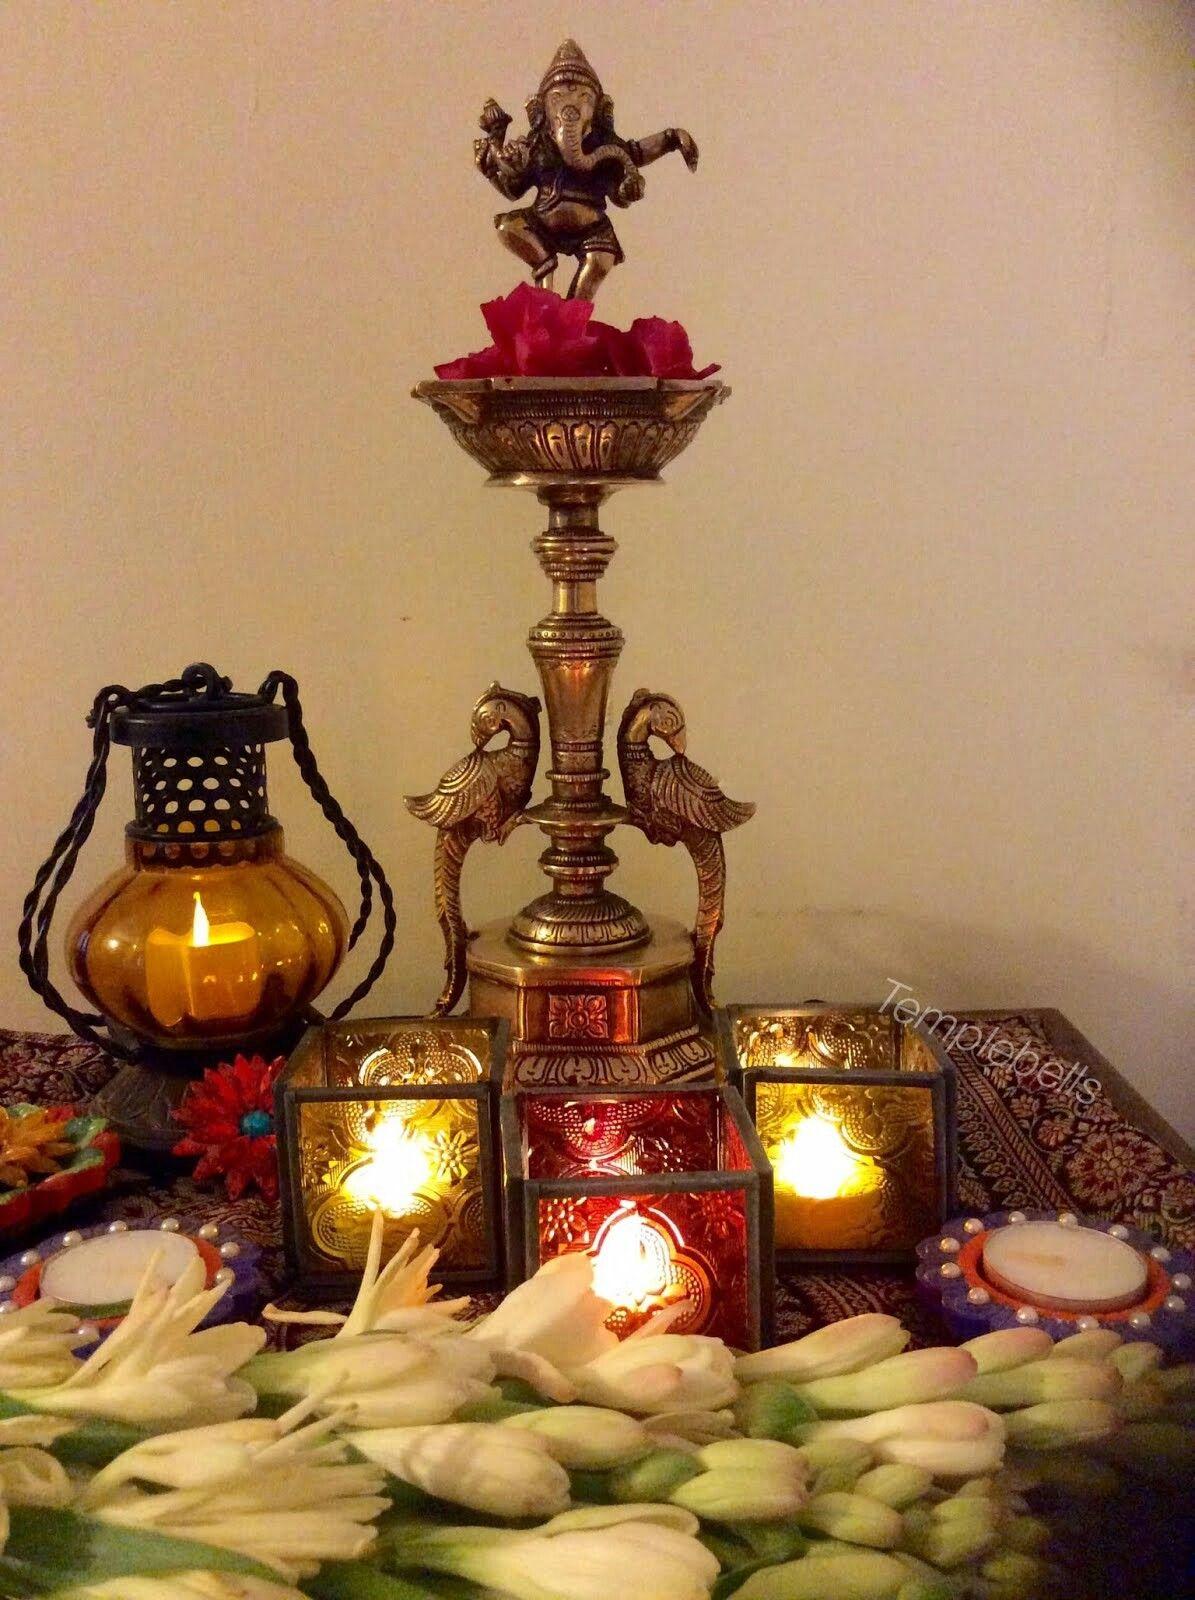 Pin by Sush Basu ~♥~ on Festive Decor   Pinterest for Lighting Lamps In Pooja Room  34eri